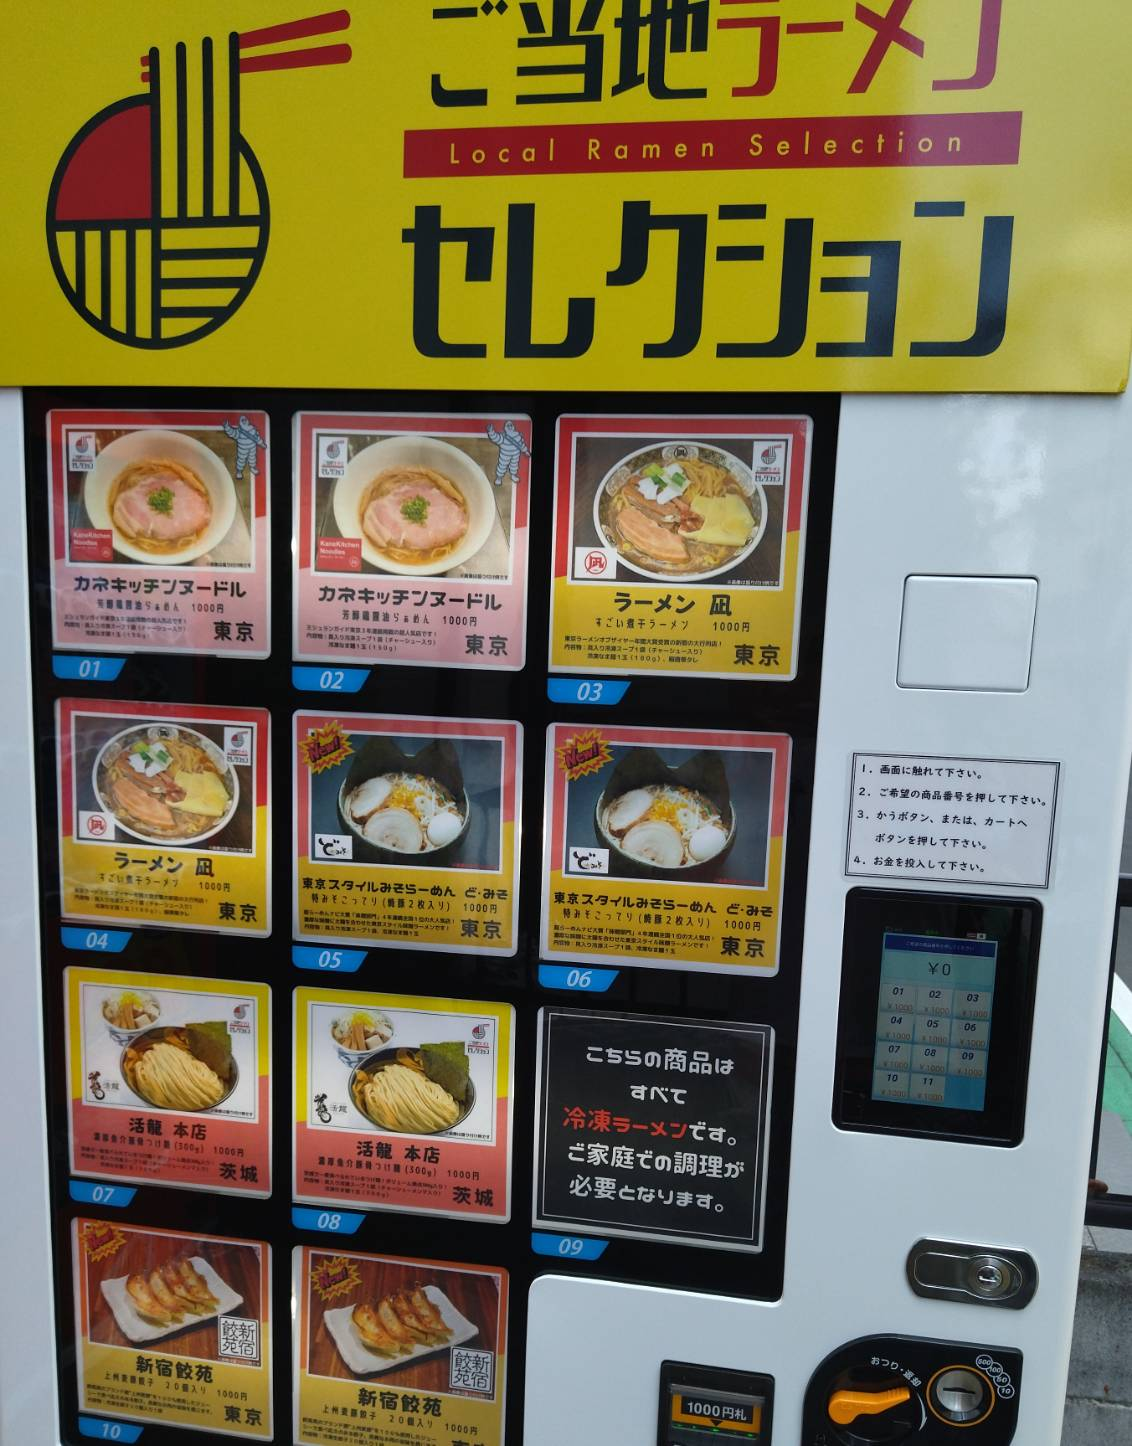 冷凍ラーメン自販機千葉県松戸市高塚新田